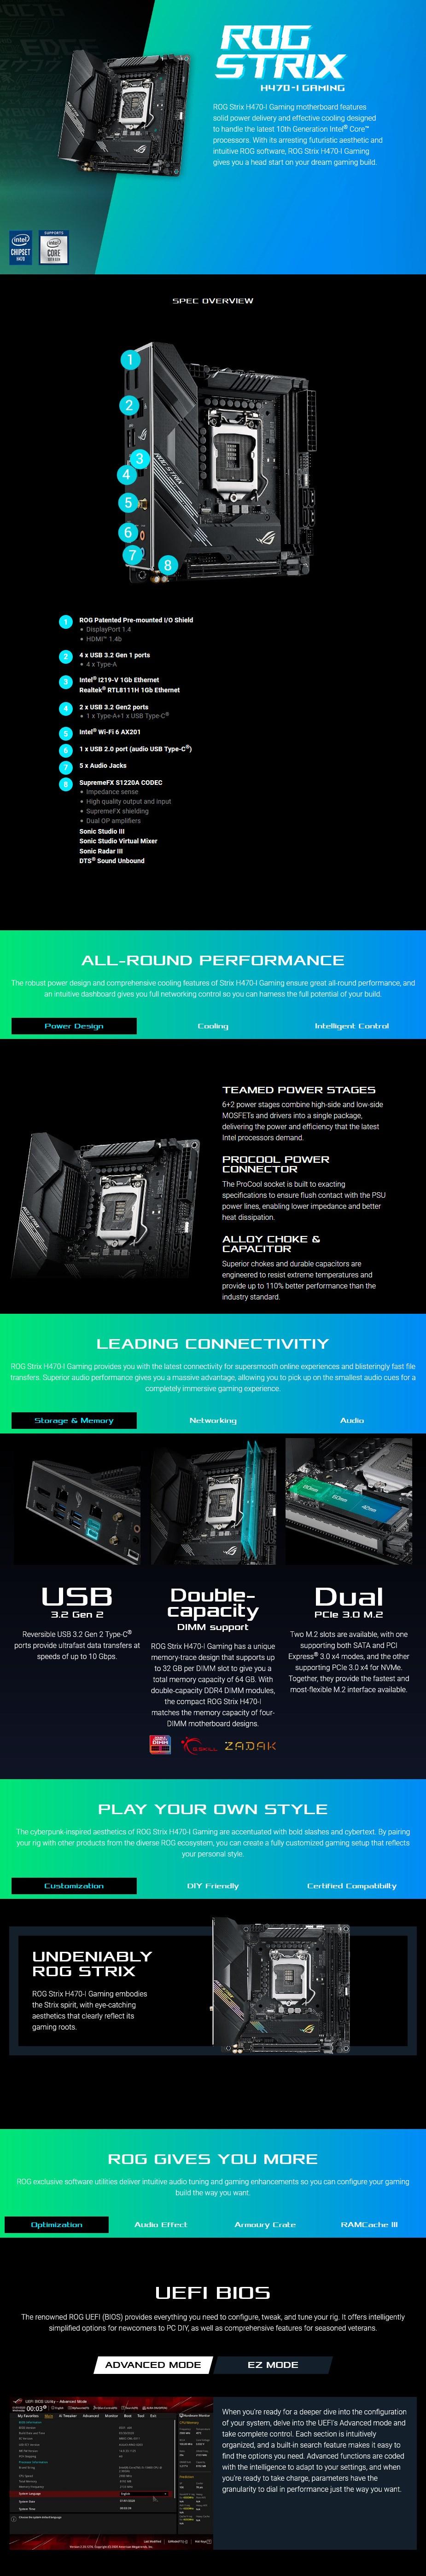 ASUS ROG STRIX H470-I GAMING LGA 1200 Mini-ITX Motherboard - Overview 1